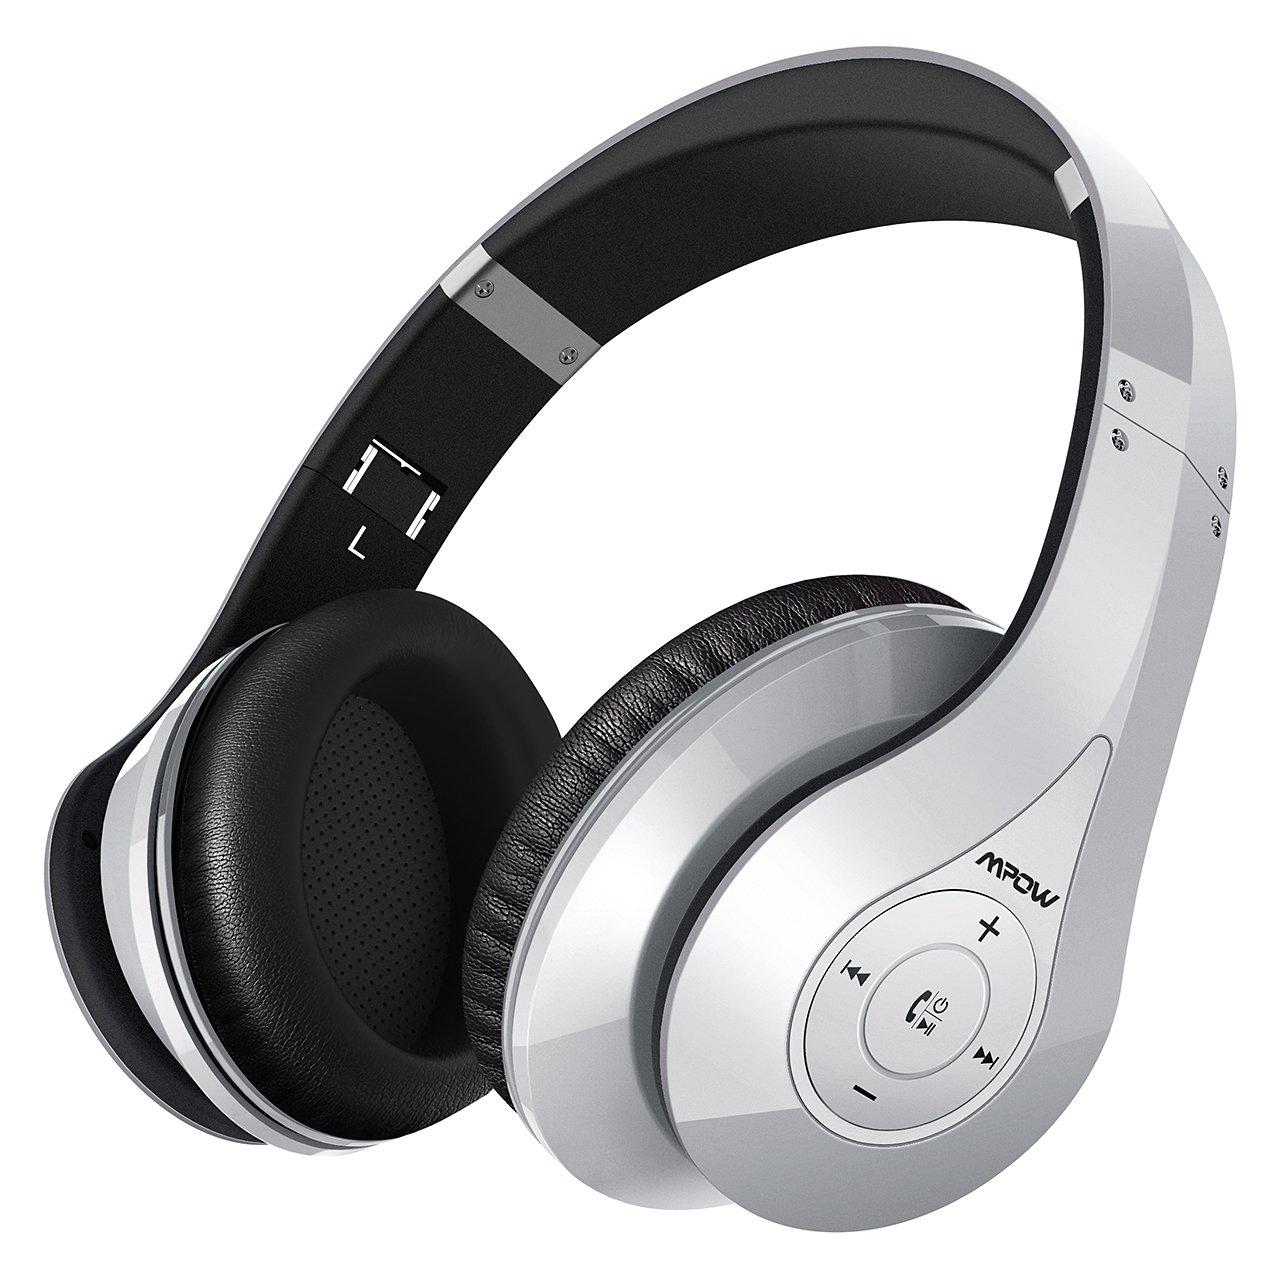 Mpow 059,Auriculares Bluetooth de Diadema Inalámbricos,Cascos Bluetooth Plegable con Micrófono Manos Libres y Hi-Fi Sonido Estéreo 20hrs Reproducción de ...